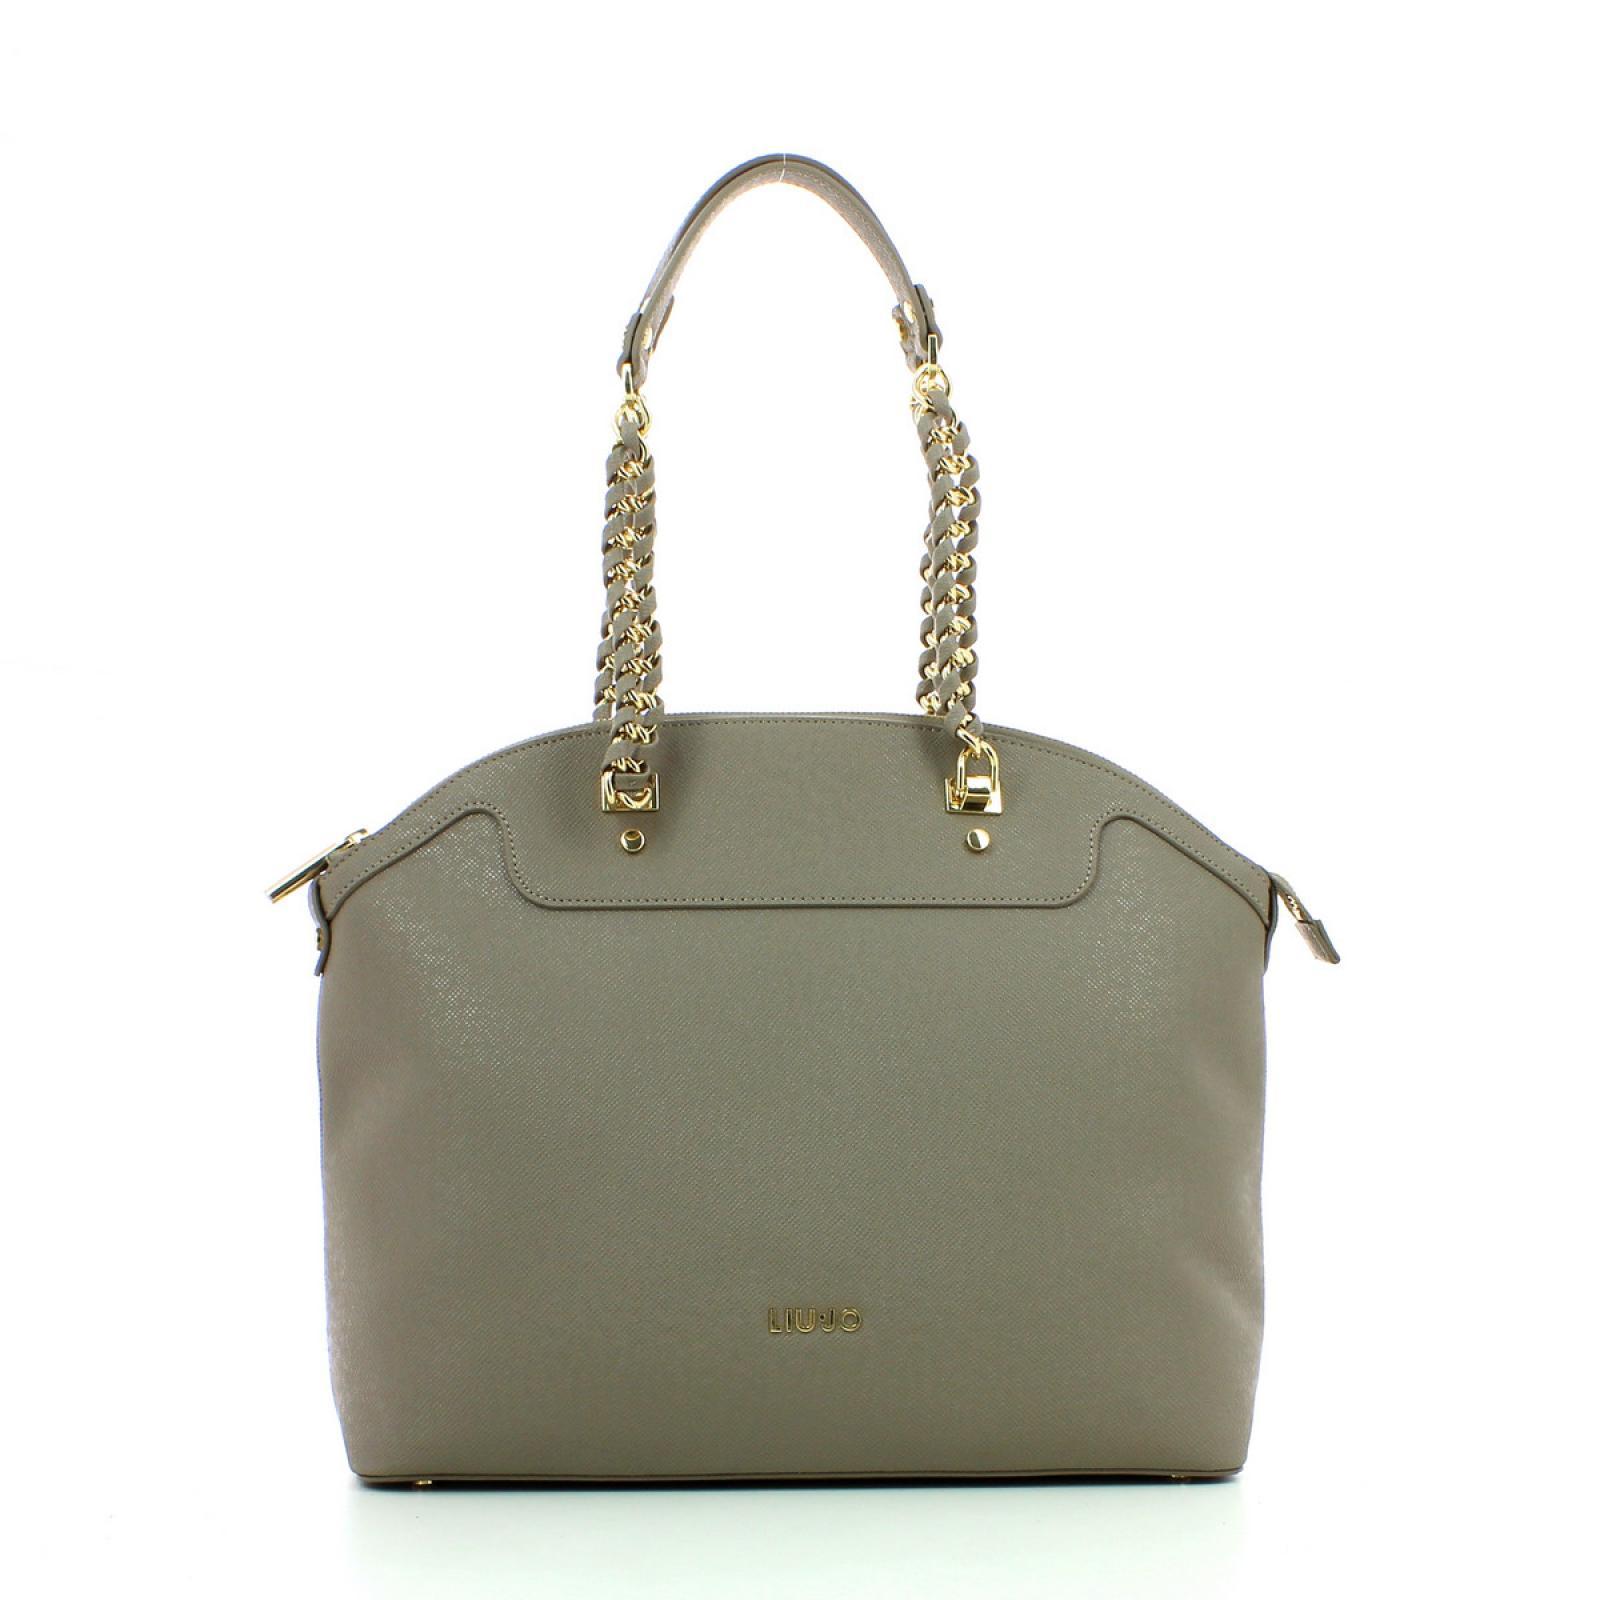 72ee50026411 Shopping Bag Anna Chain-TORTORA-UN. 817000008042. Brand. Liu Jo